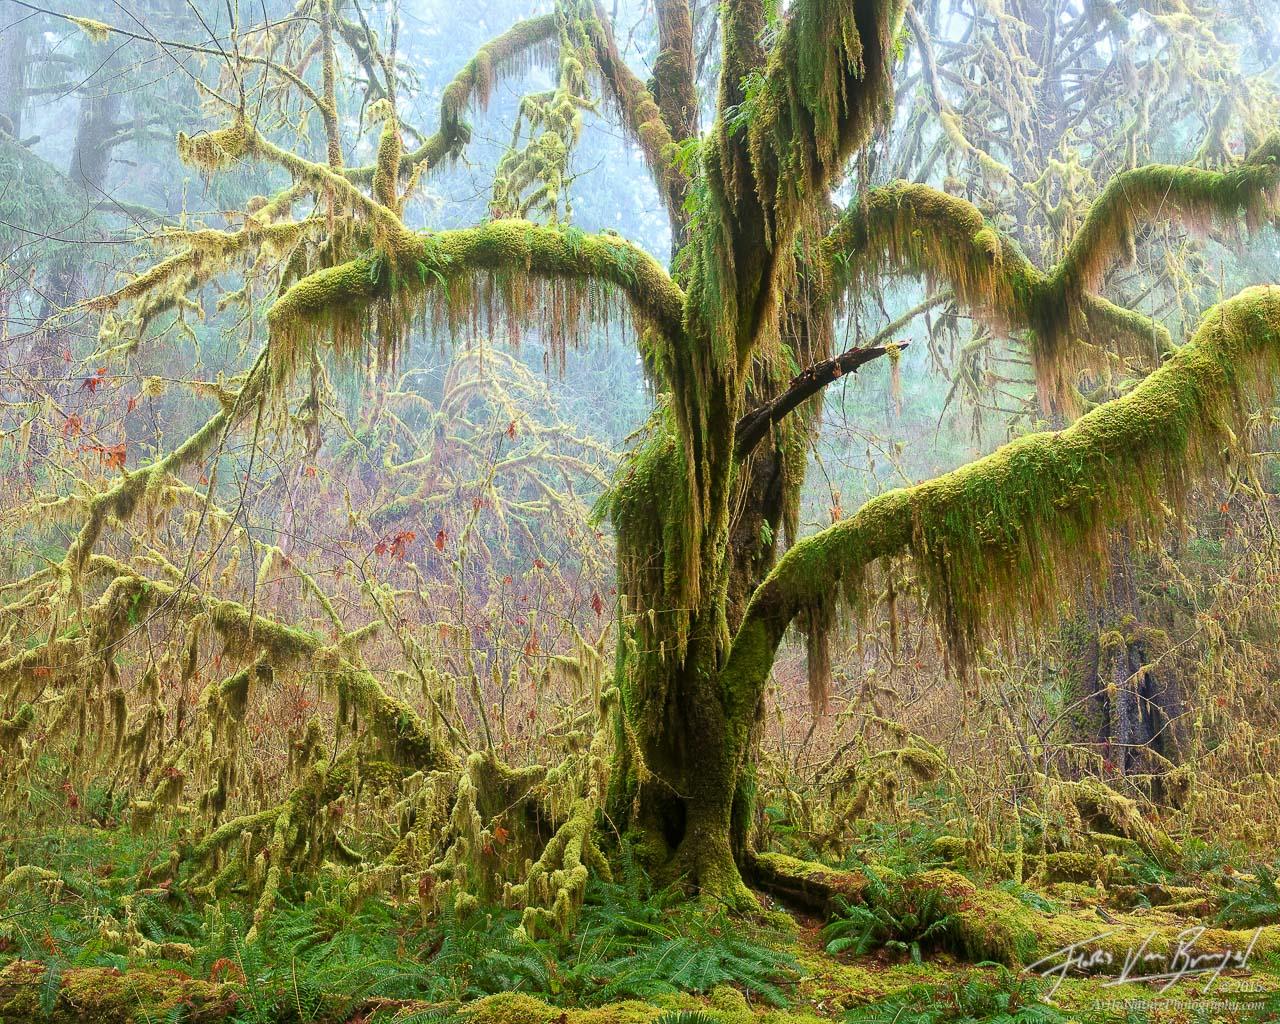 Hoh Rainforest Mossy Tree, Olympic National Park, Washington, Spirit of the Hoh, maple, fog, , photo